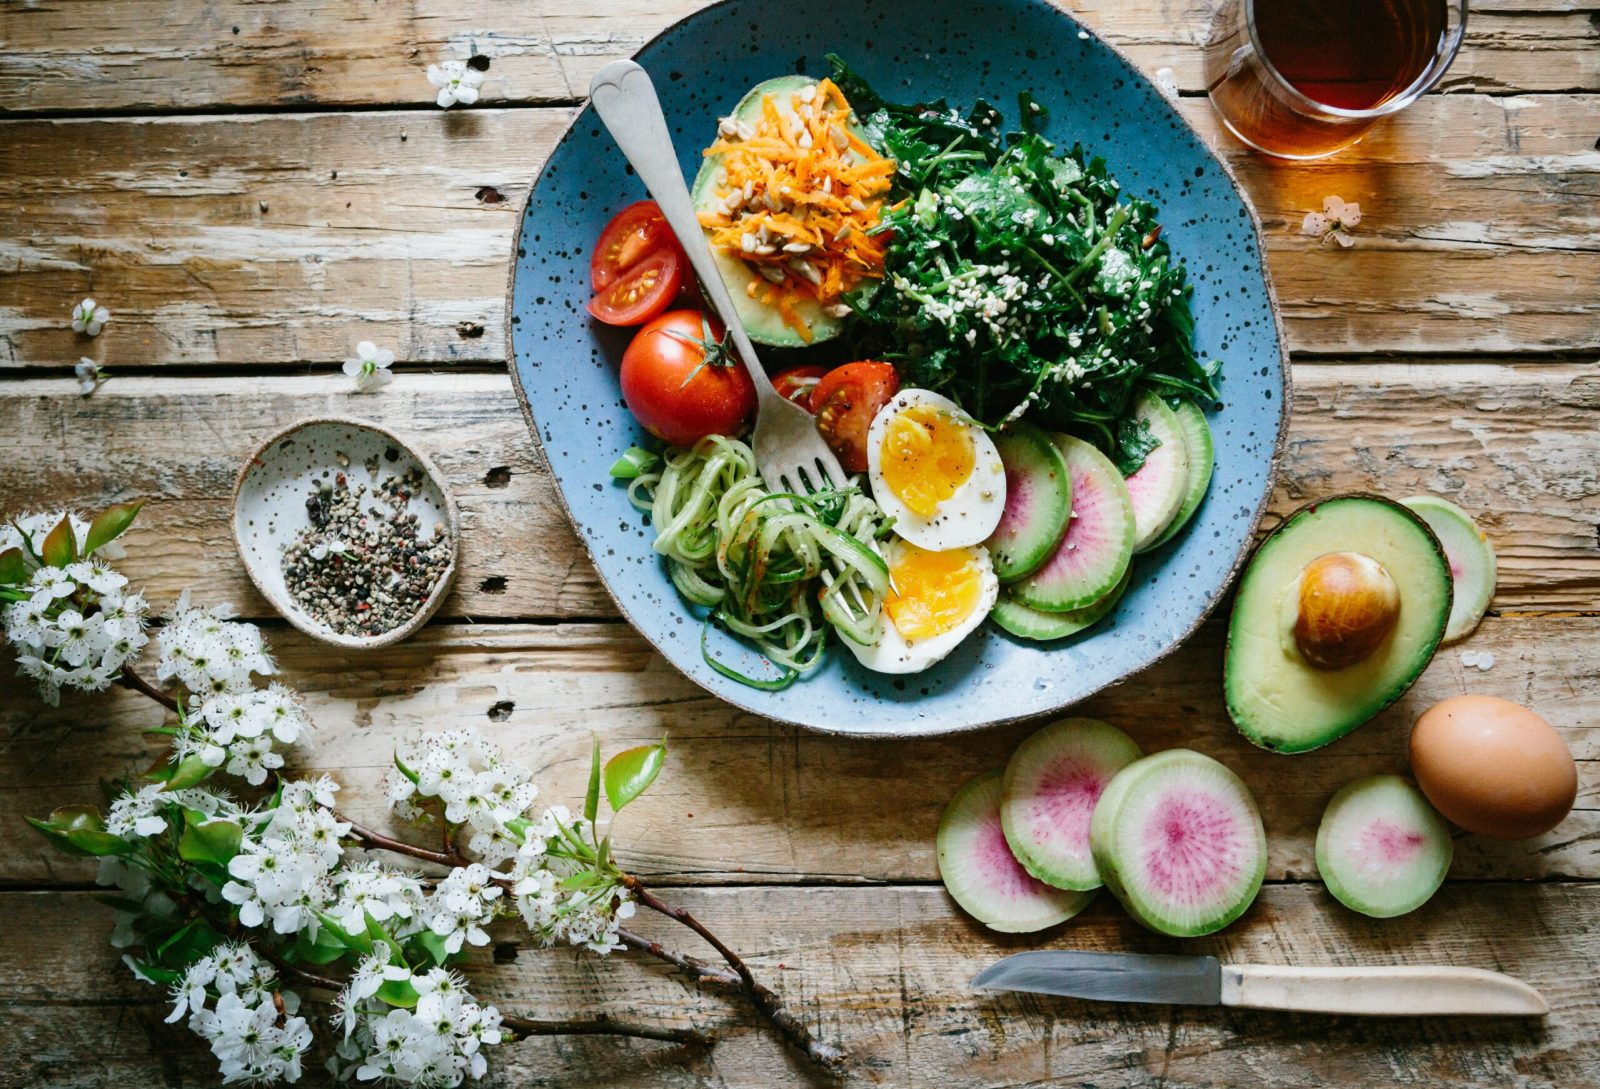 Mediterranean diet helps with Erectile Dysfunction